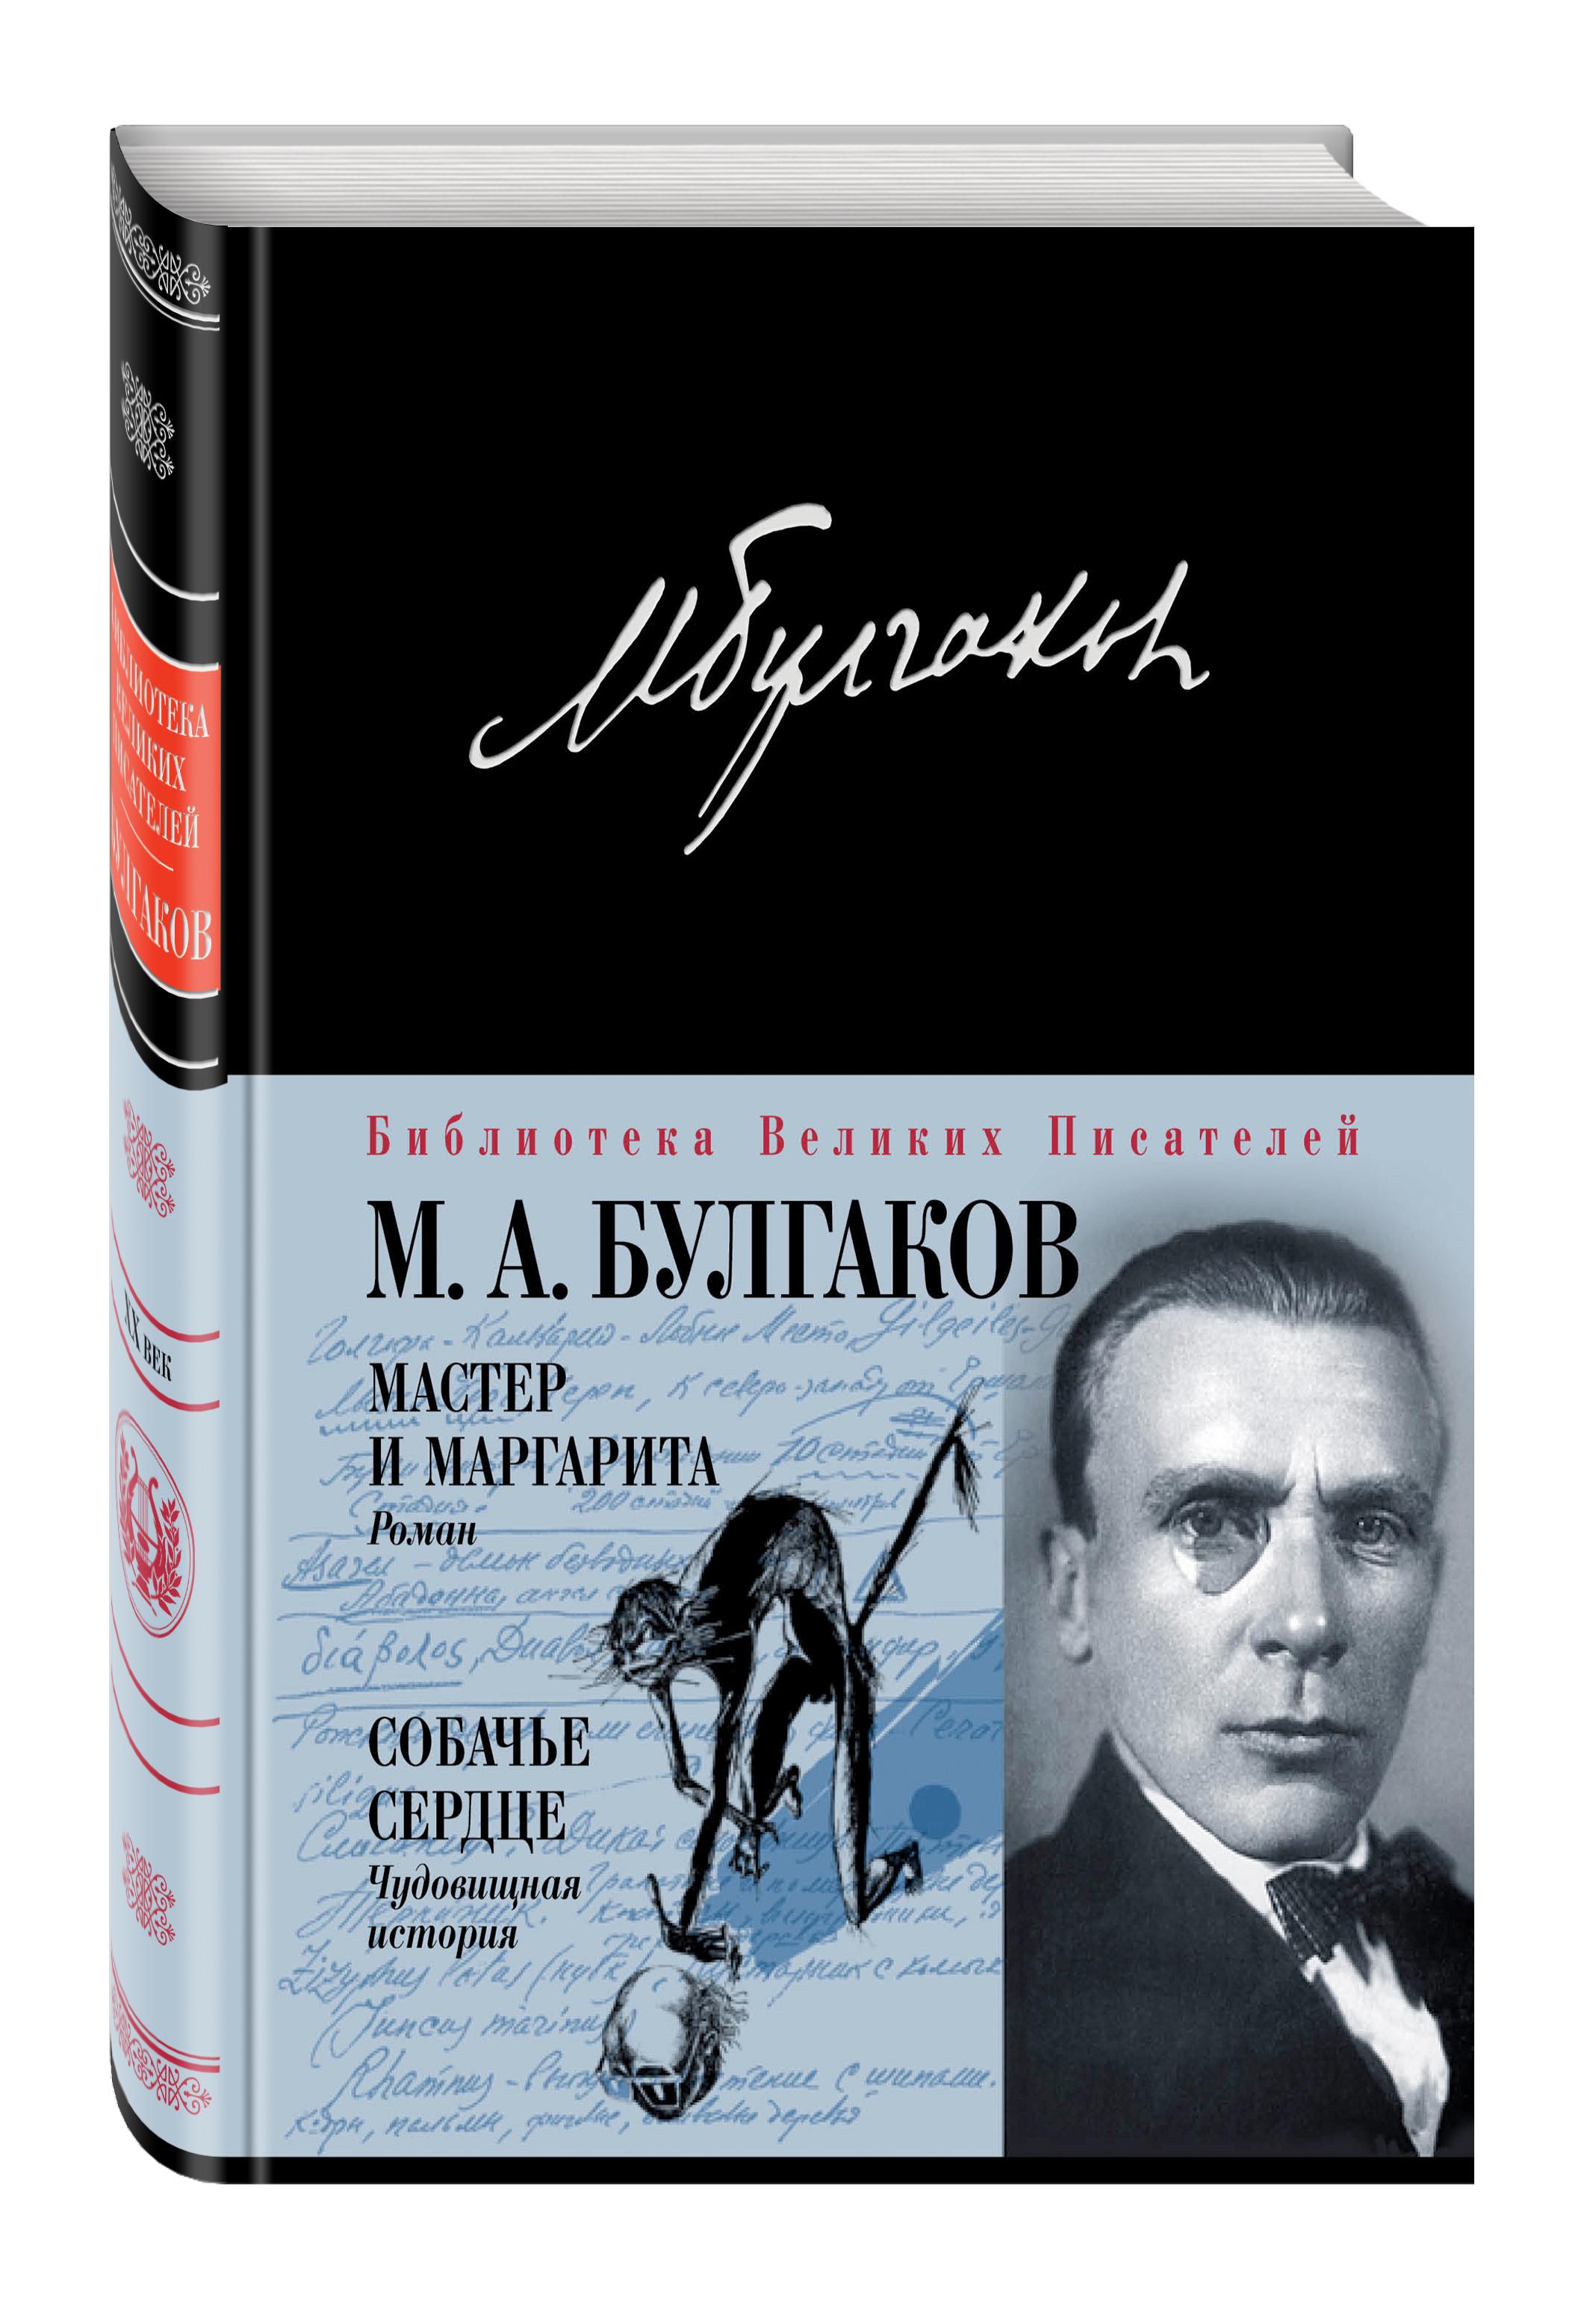 Булгаков М.А. Мастер и Маргарита. Собачье сердце